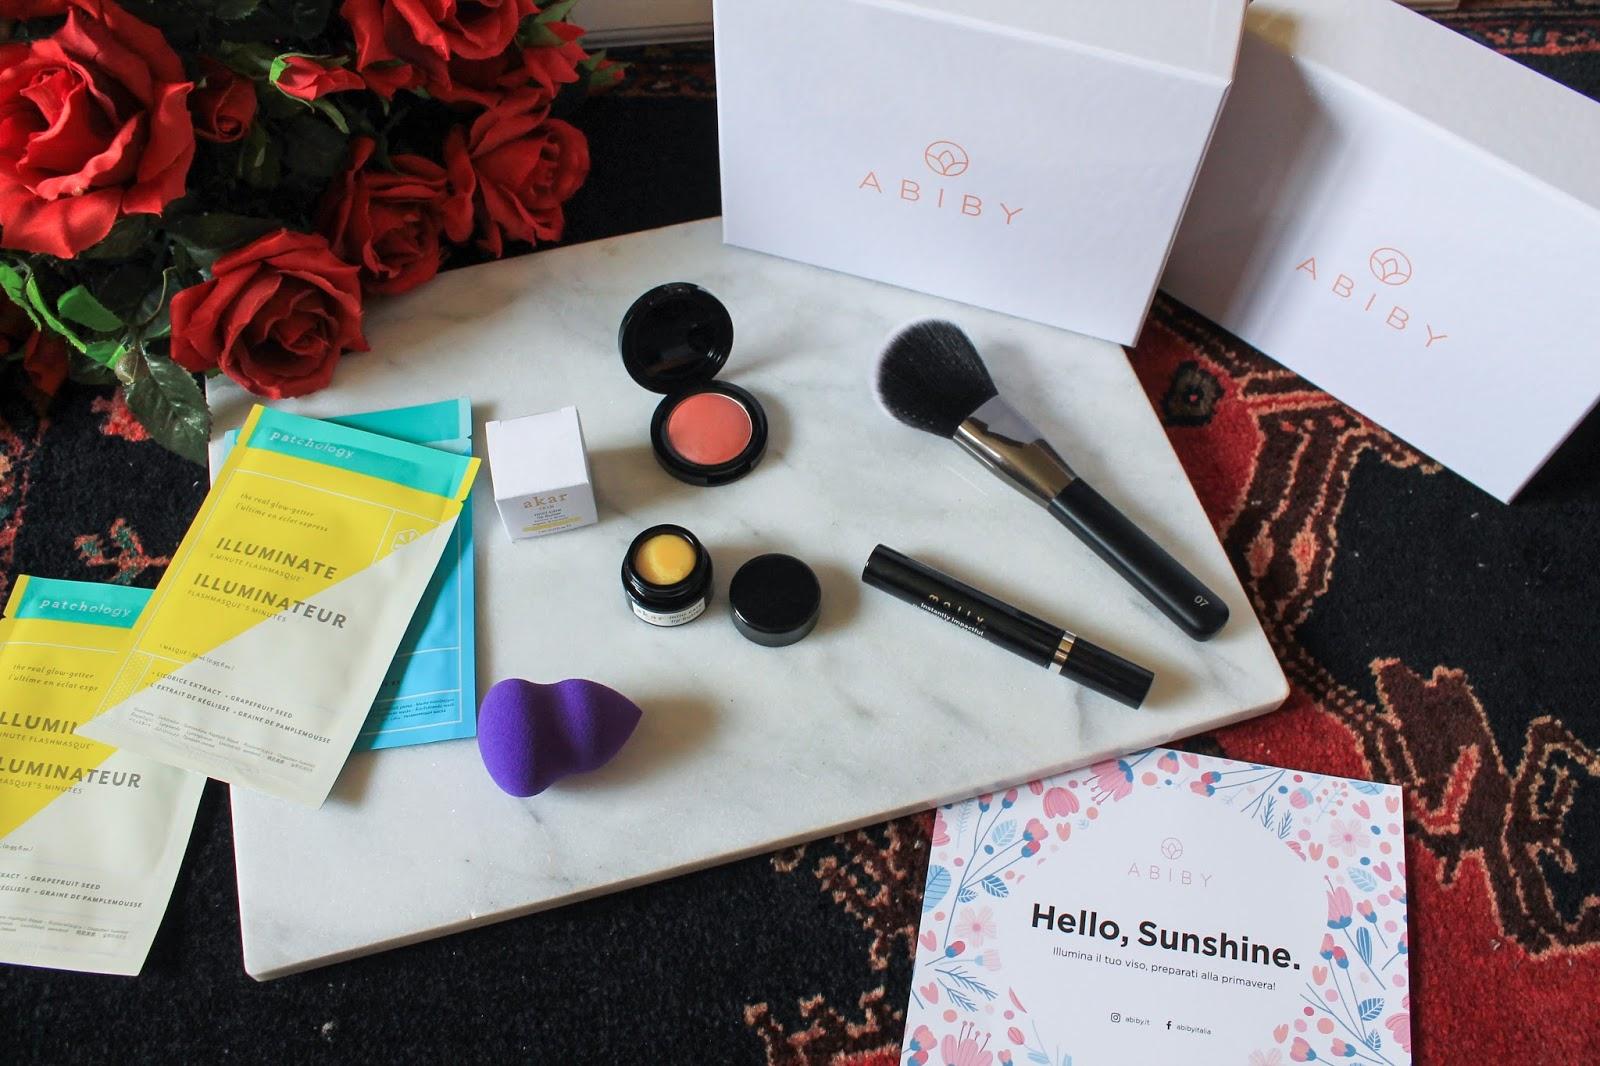 Abiby beauty box aprile 2018